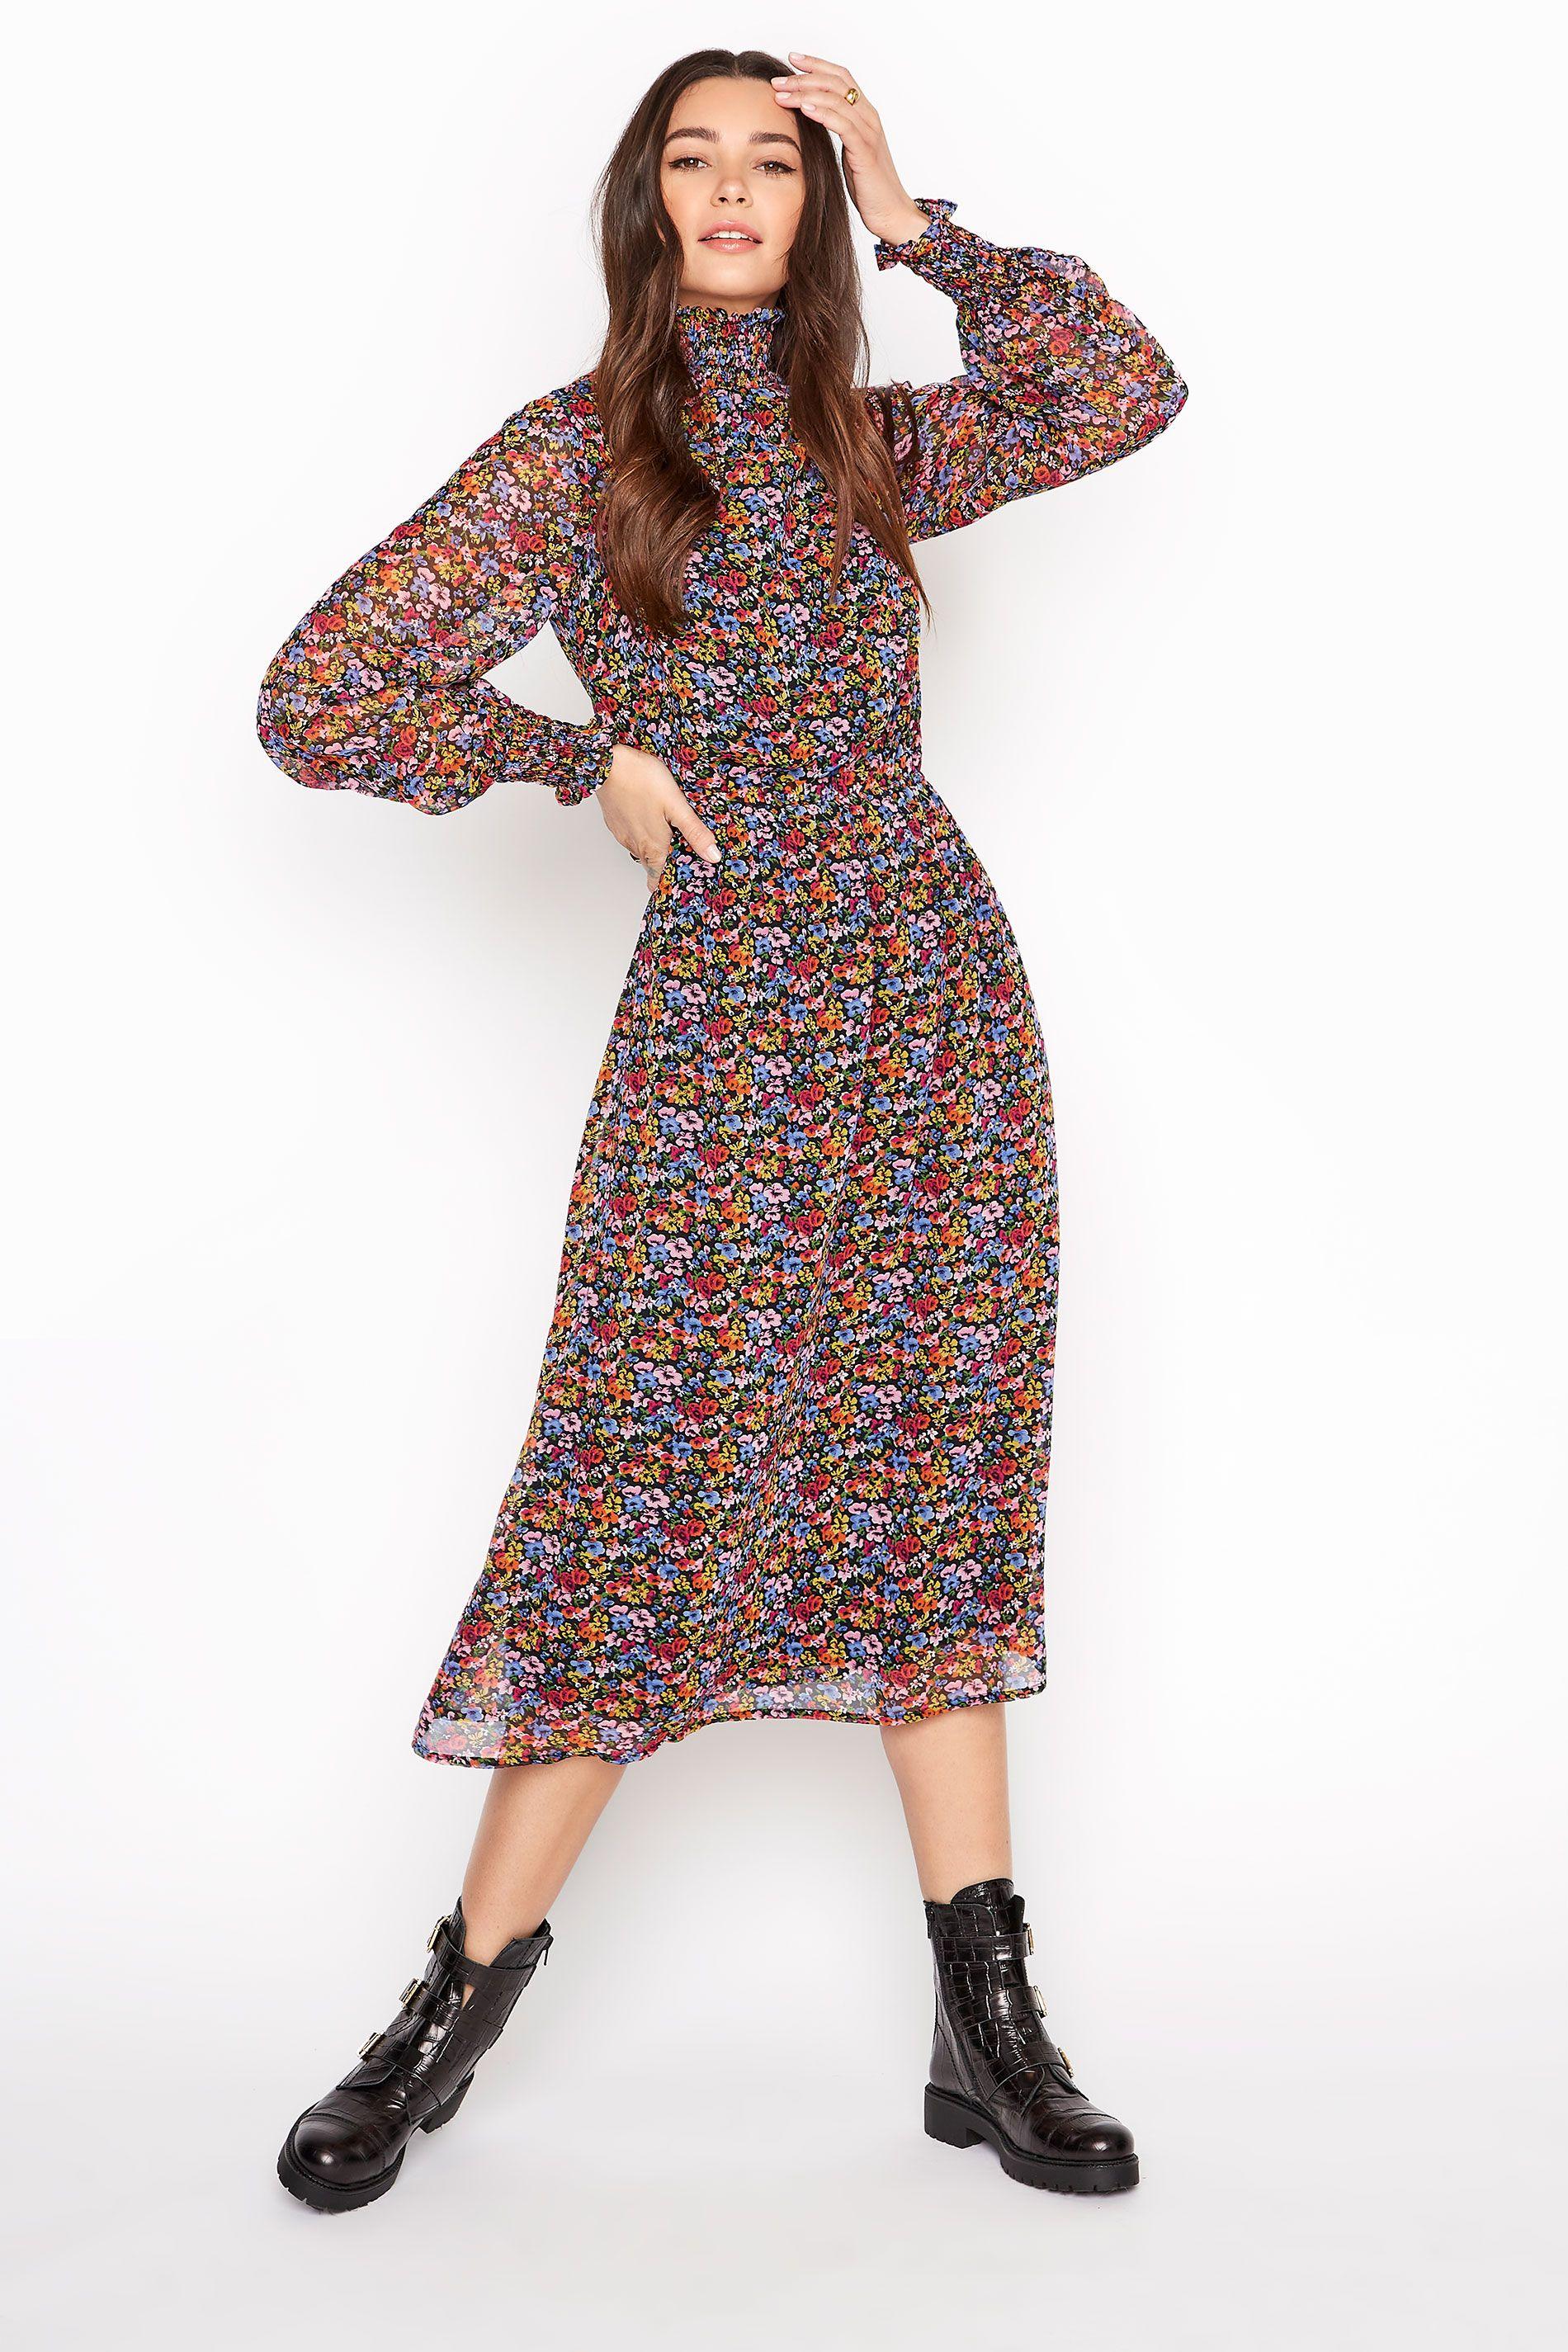 Tall Floral Chiffon Midi Dress Sizes 8 32 In 2021 Clothing For Tall Women Girls Maxi Dresses Extra Long Maxi Dress [ 2850 x 1900 Pixel ]